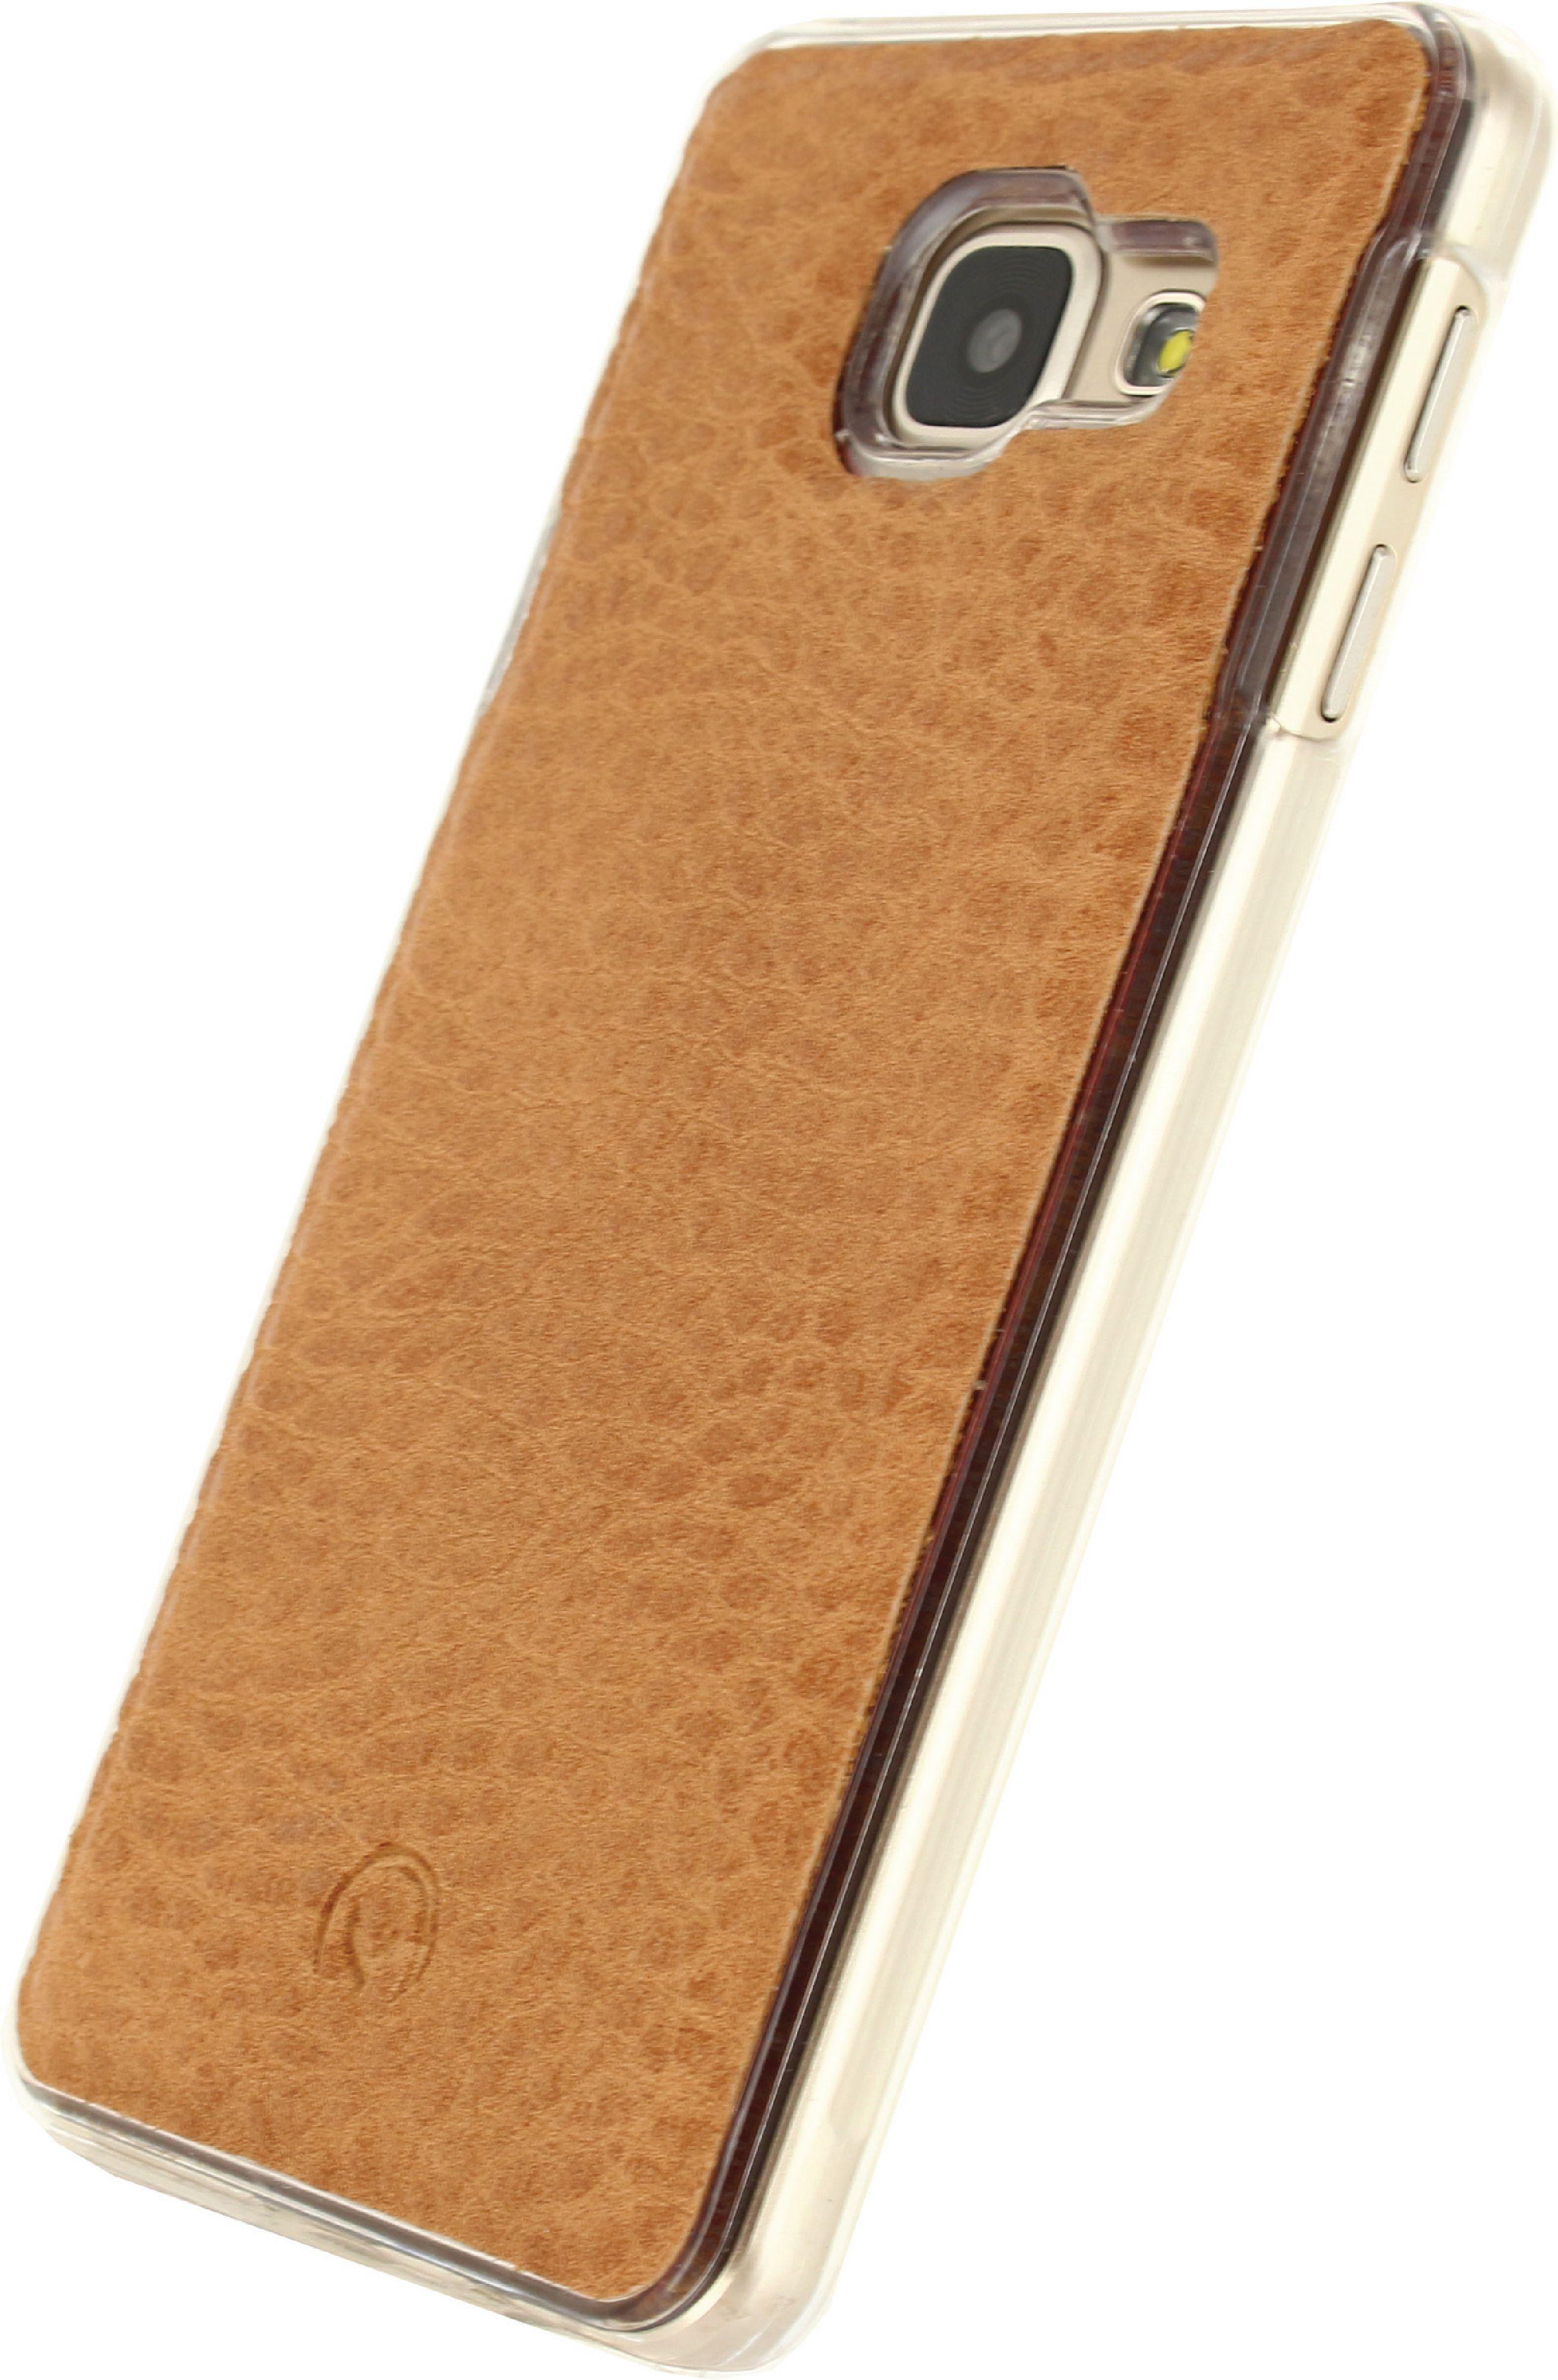 Image of   Telefon Aftageligt Lommebogsetui Samsung Galaxy A3 2016 Brun